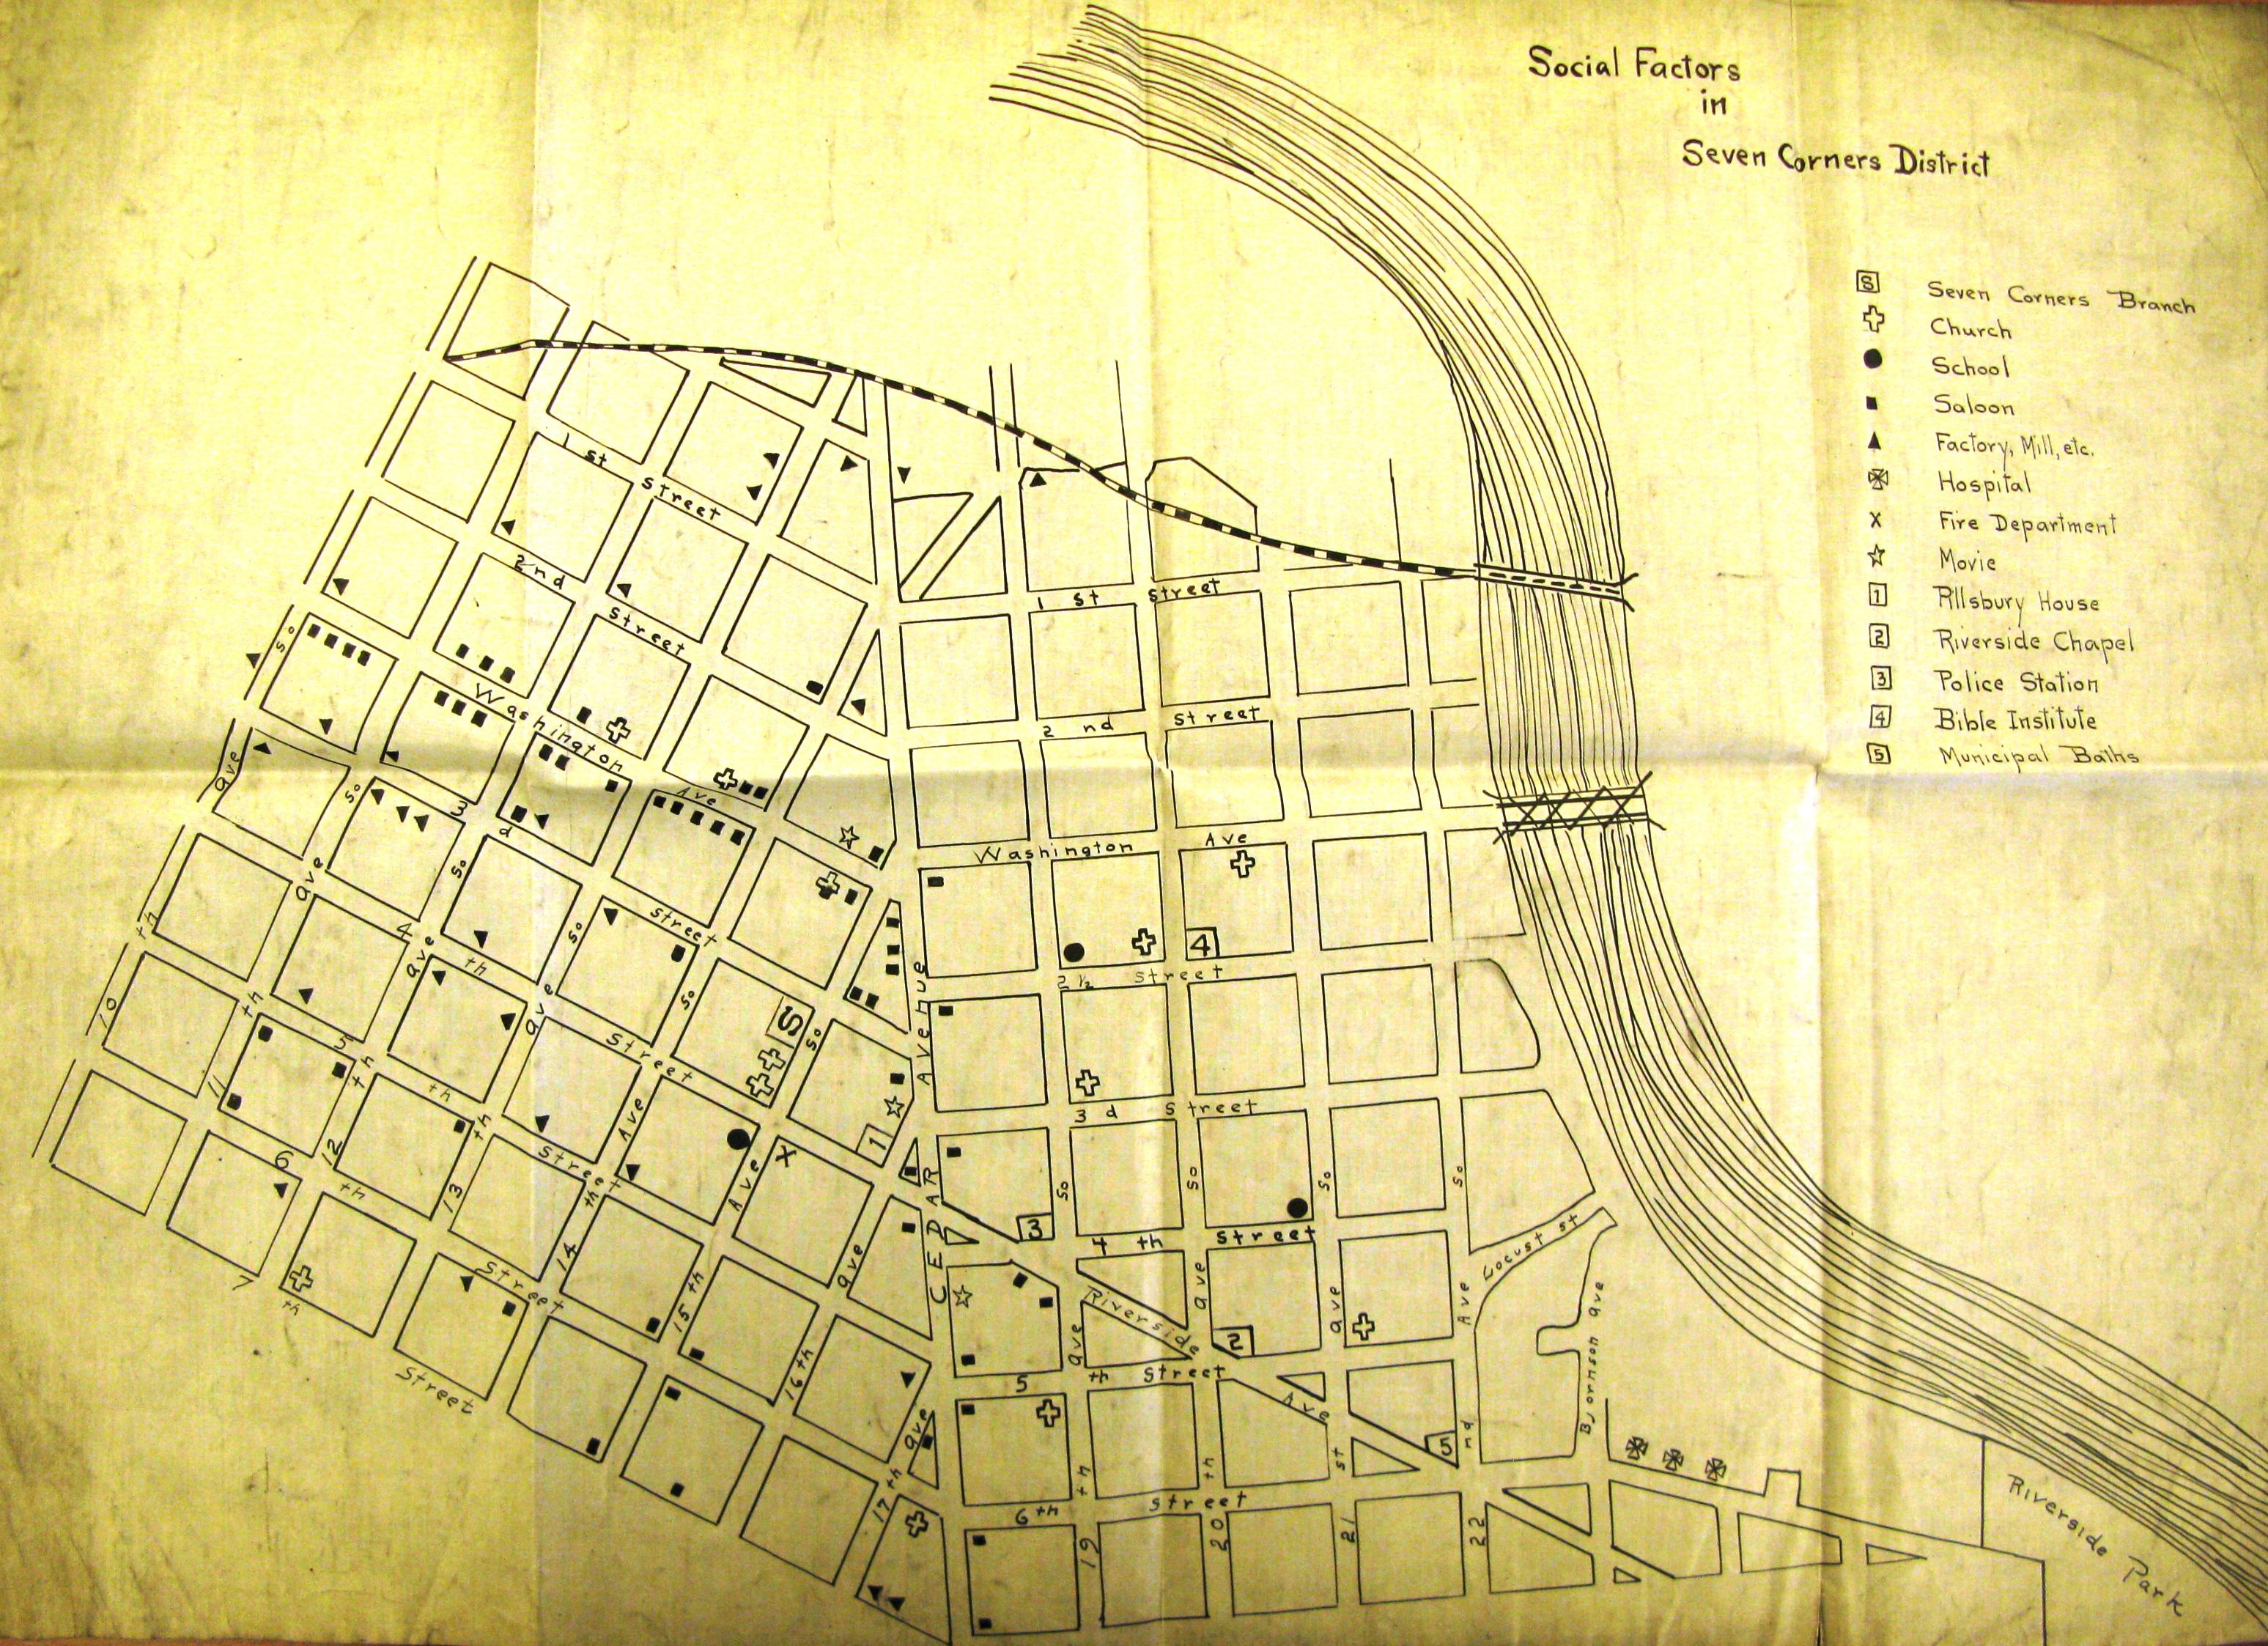 community assets map, seven corners, 1915, grace stevens, hclib